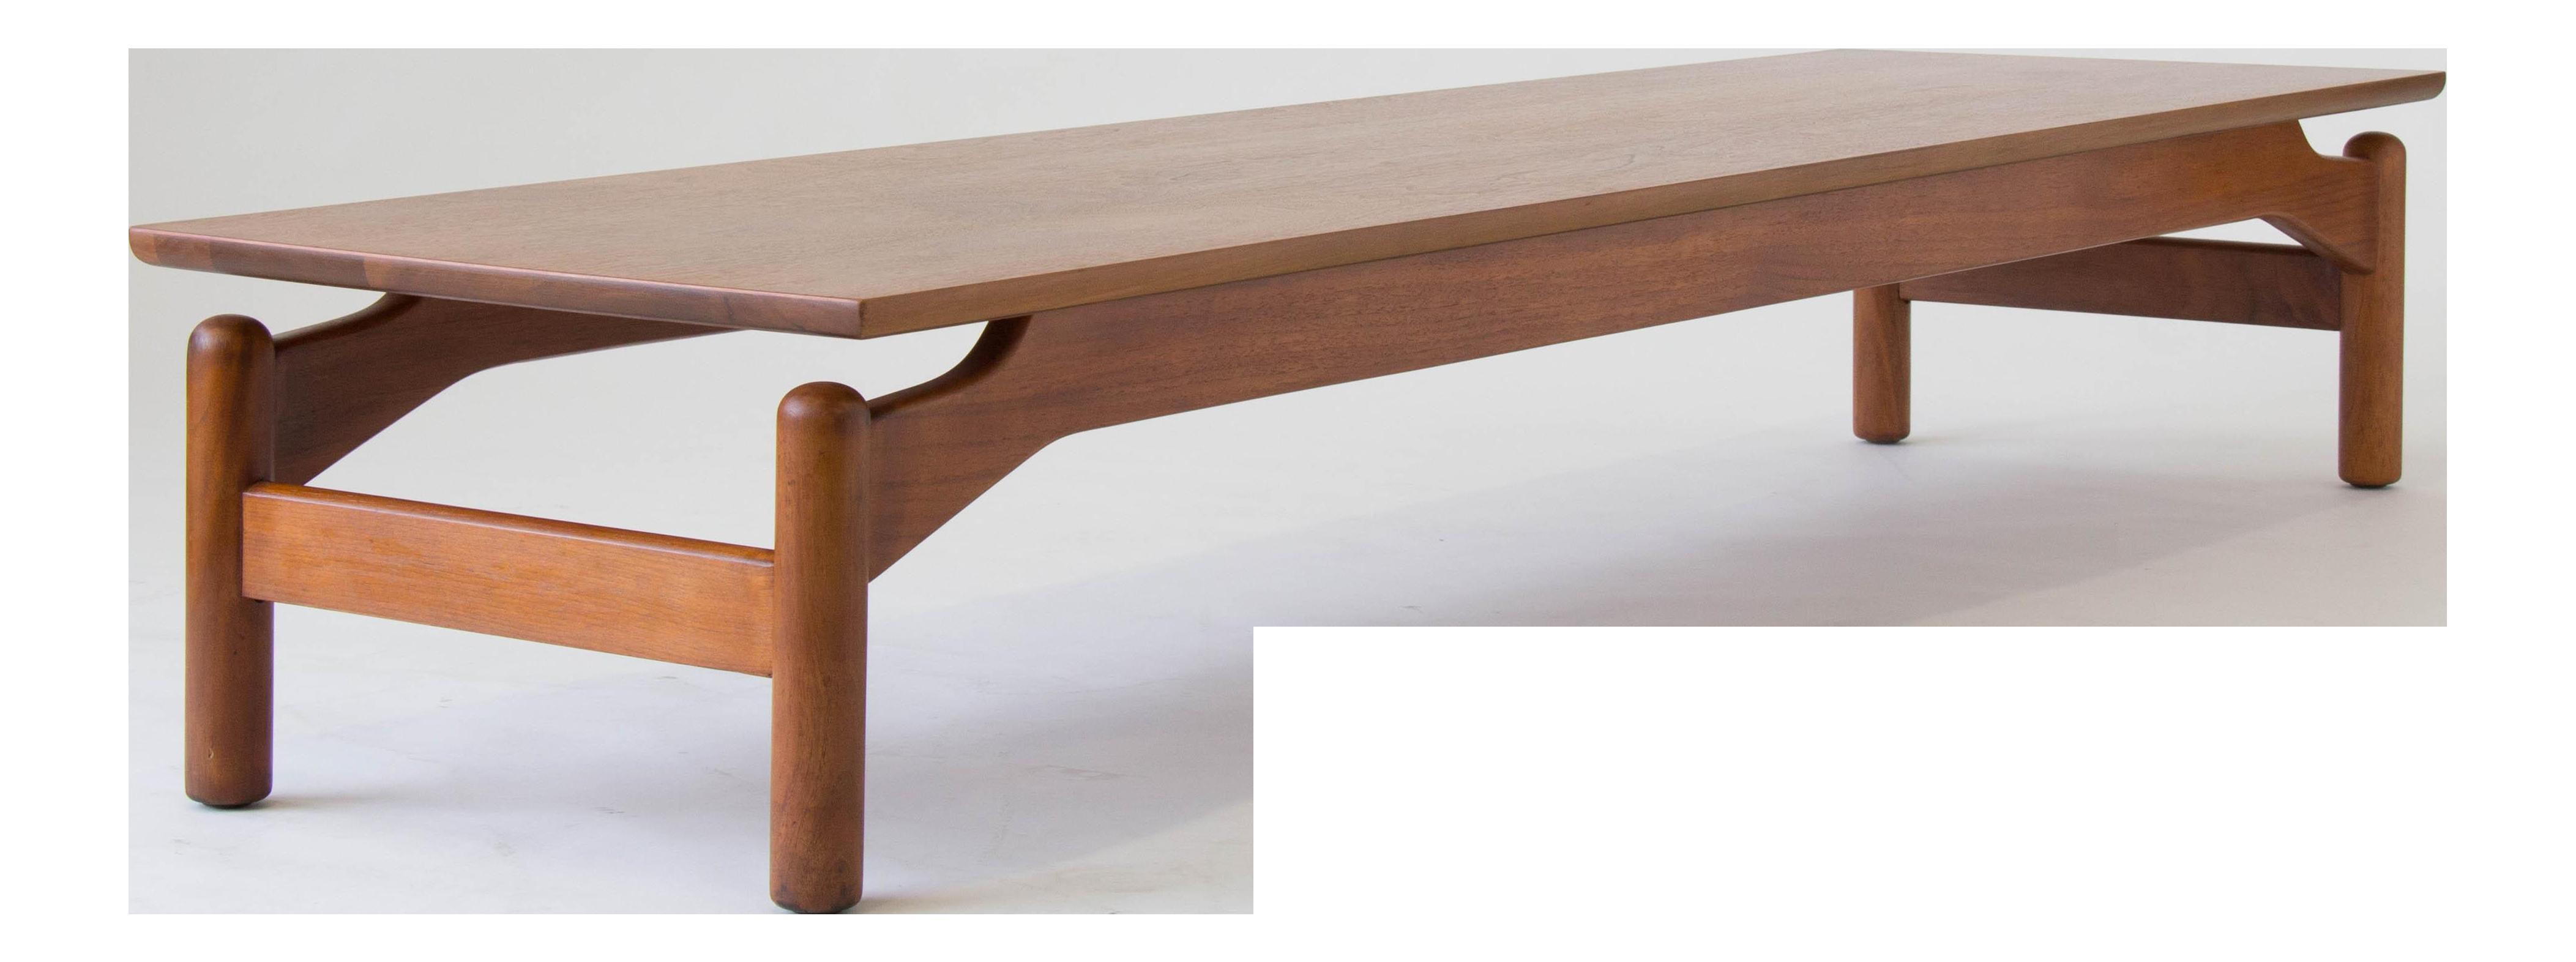 Walnut coffee table by greta grossman for glenn of california on walnut coffee table by greta grossman for glenn of california on decaso geotapseo Gallery